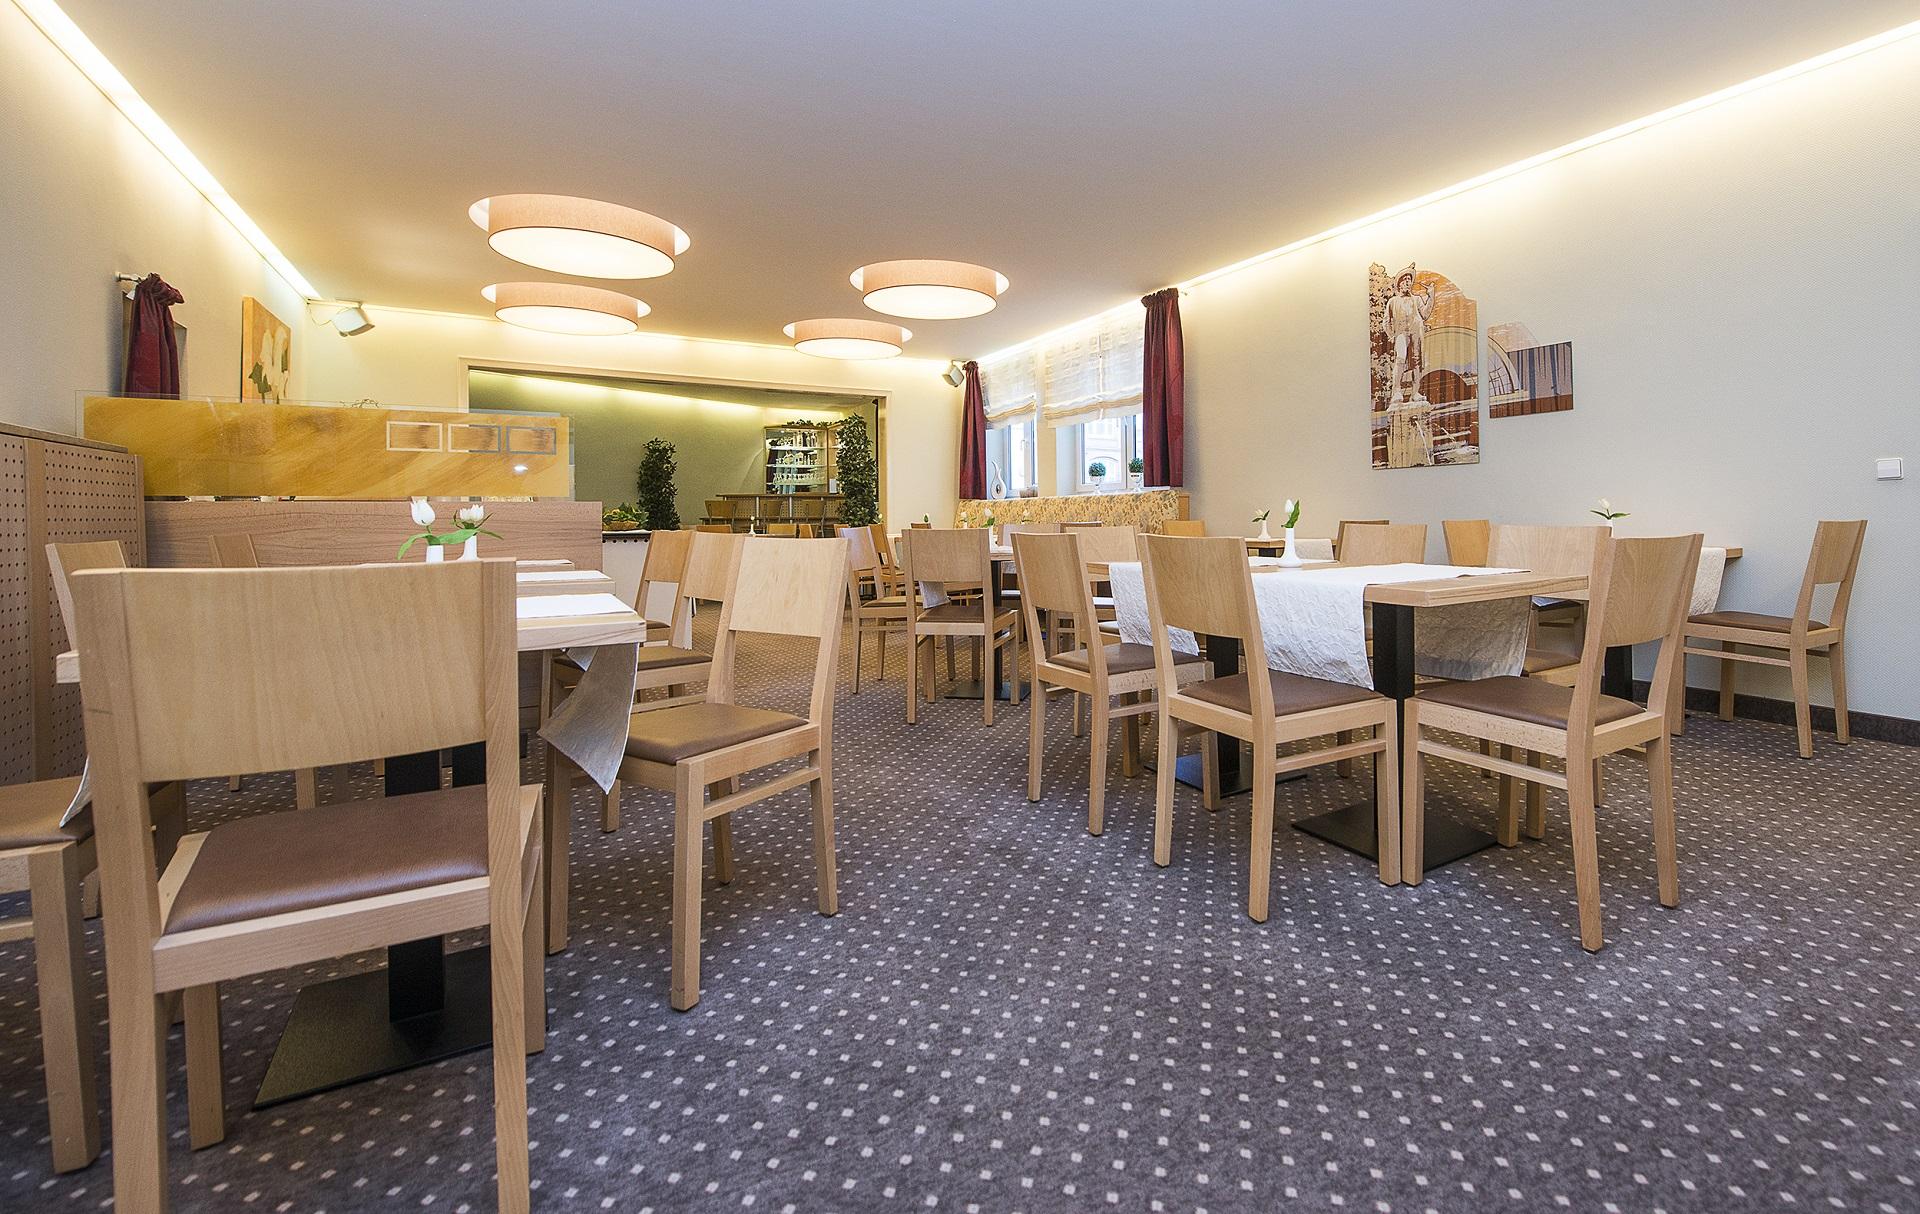 Hotel comfort garni in bielefeld for Hotel bremen bielefeld